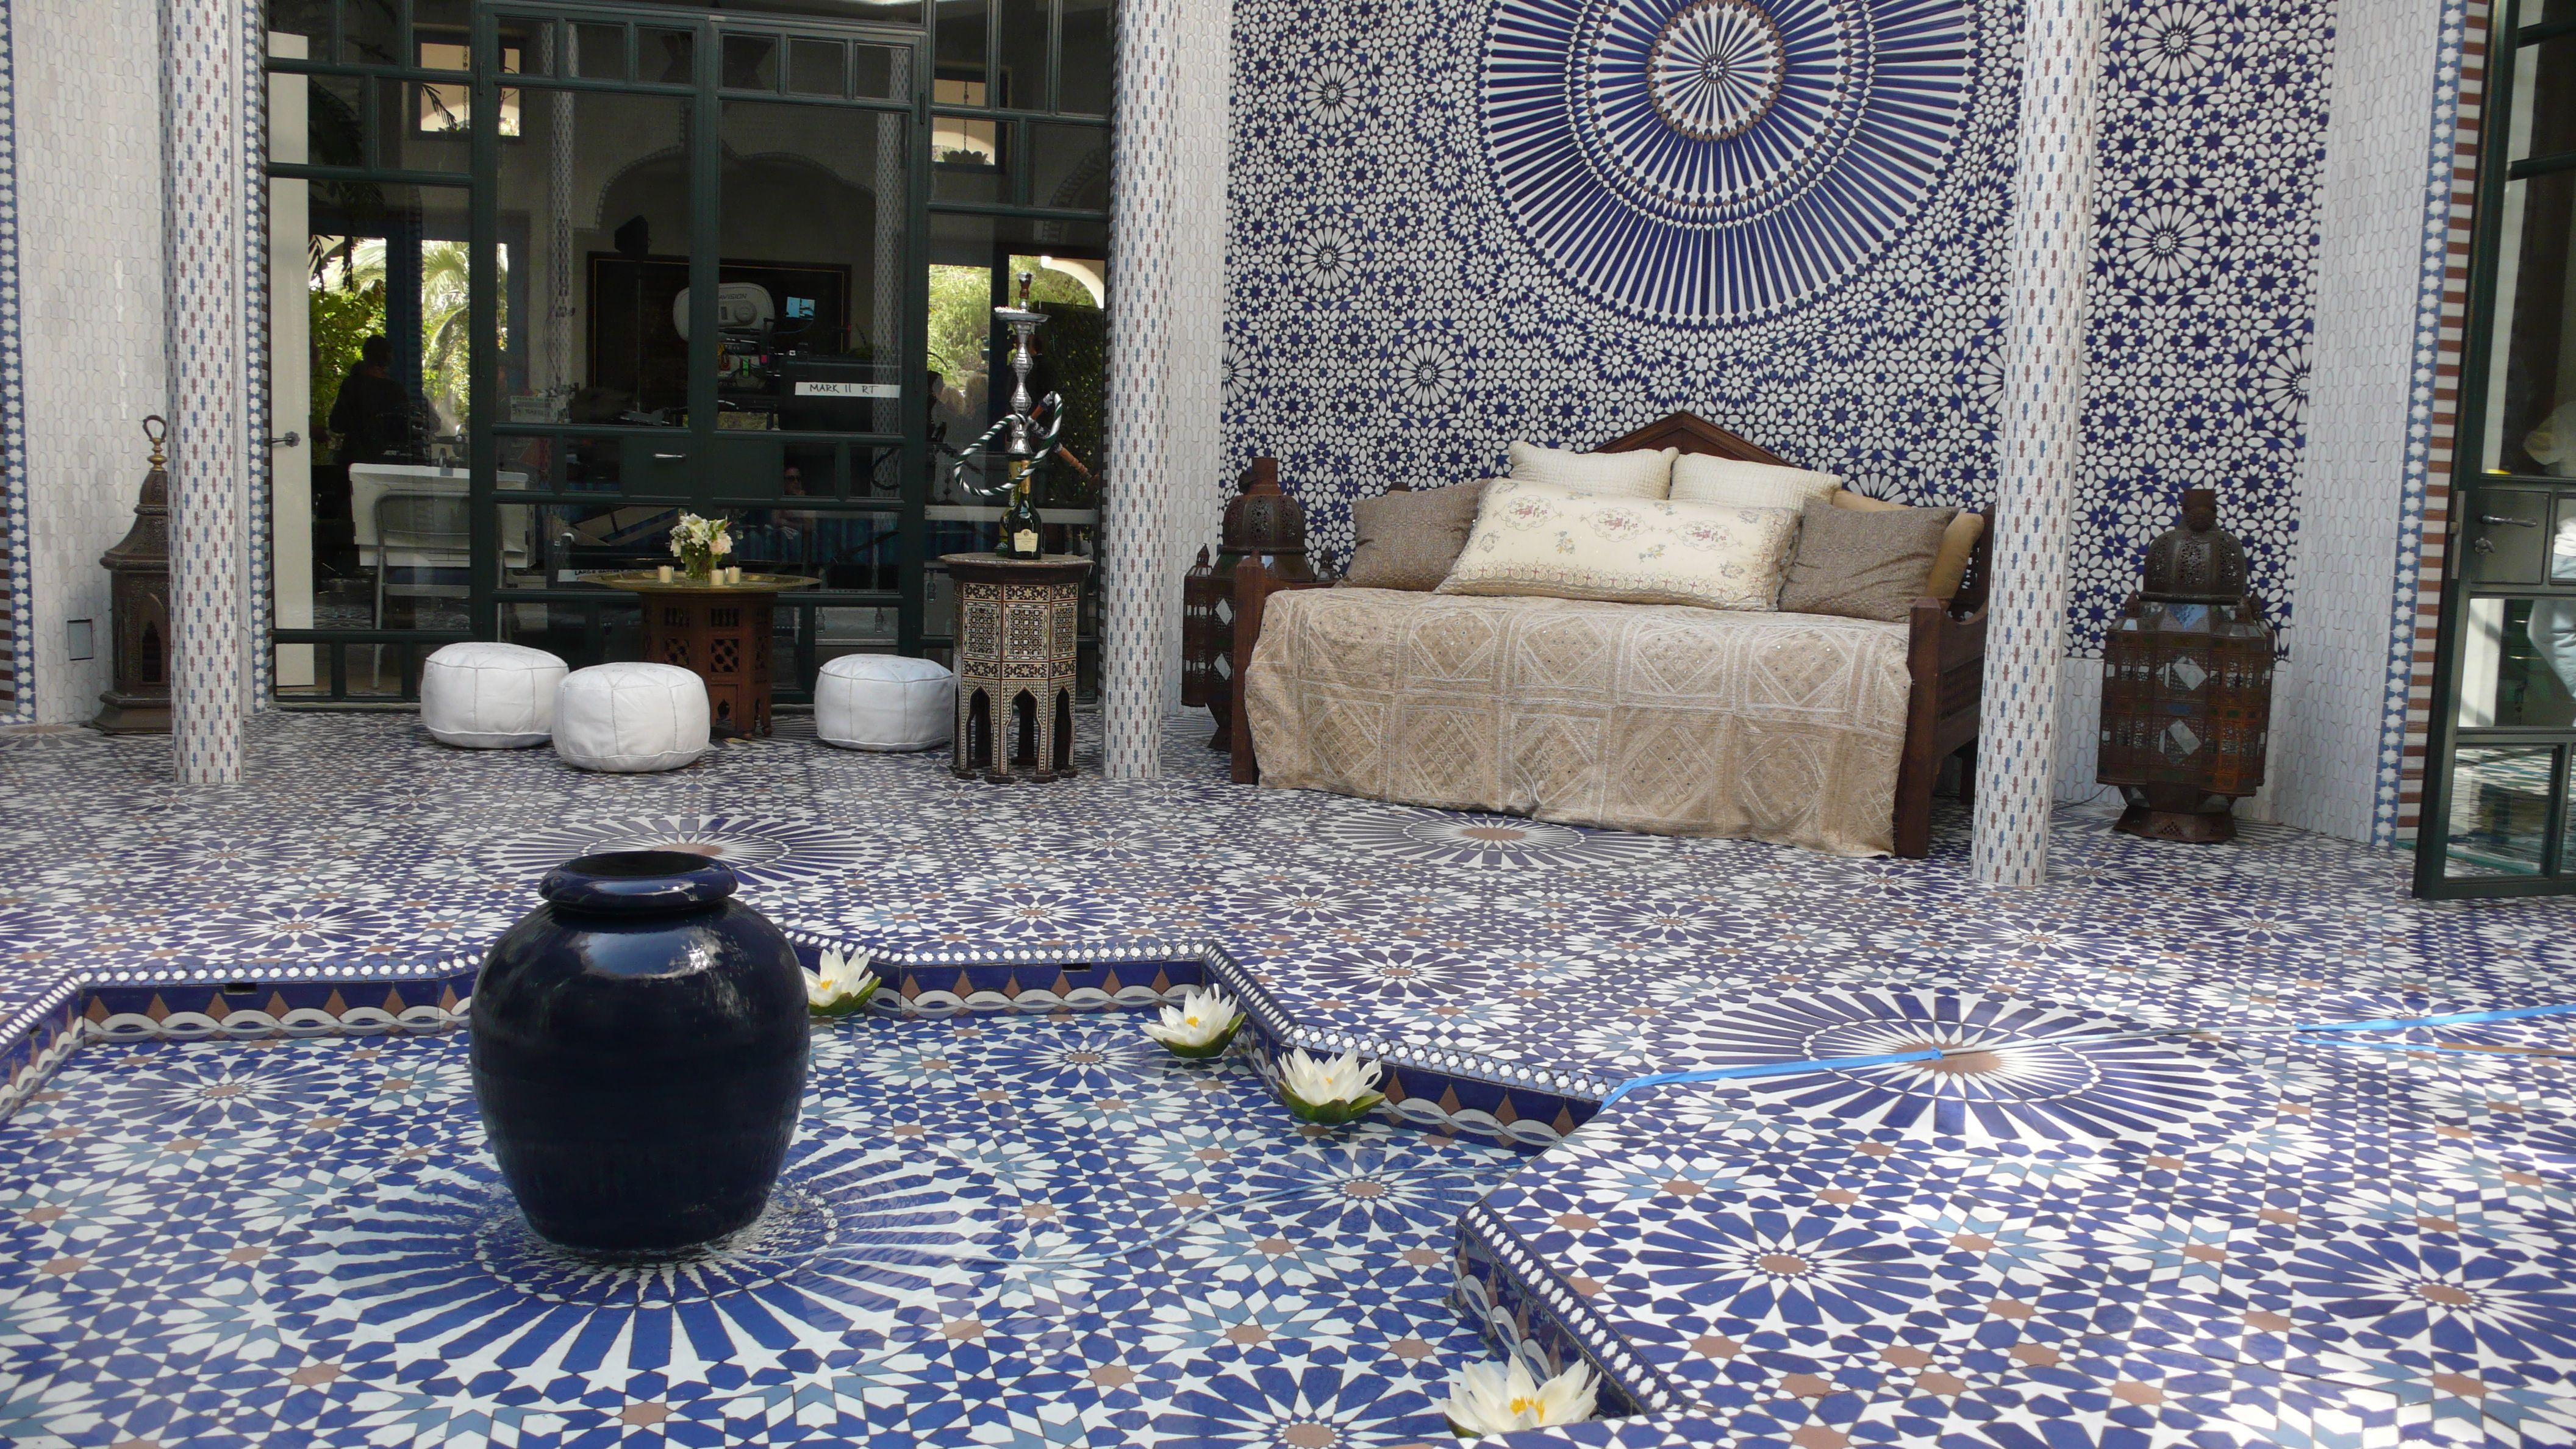 Moorish tiles garden welcome to badia design inc moroccan tiles moorish tiles garden welcome to badia design inc moroccan tiles dailygadgetfo Gallery